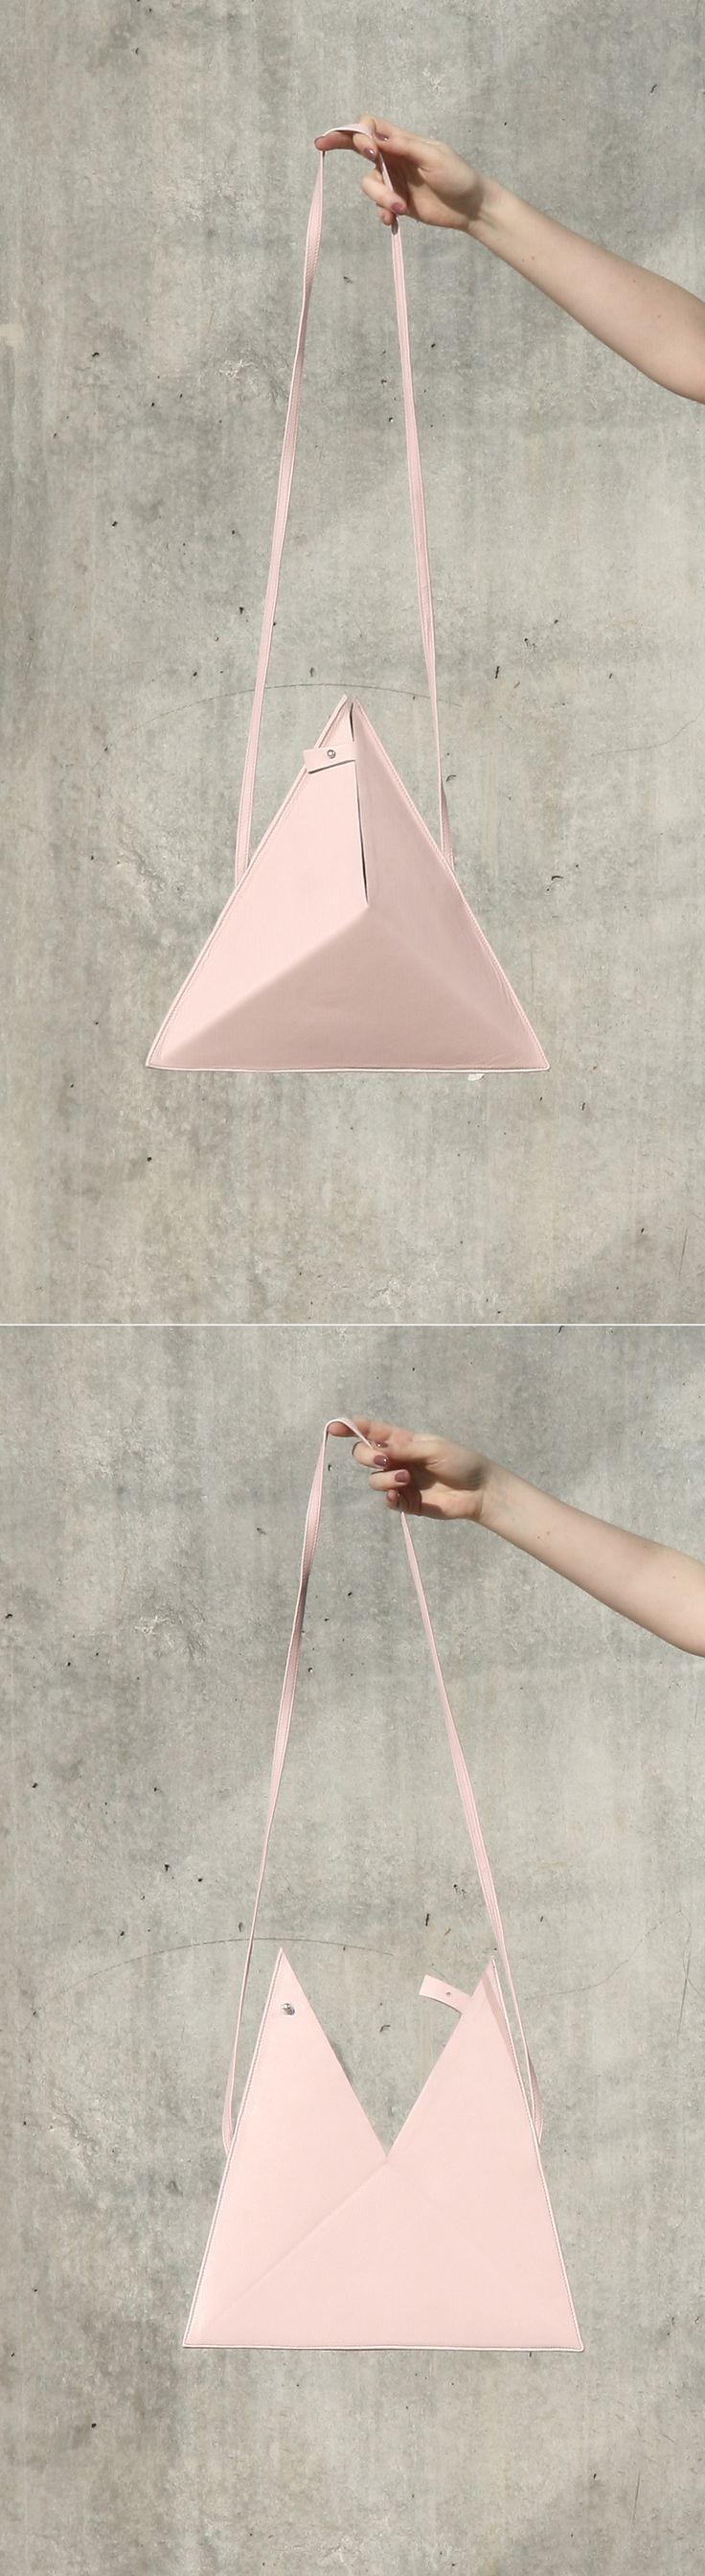 Triangle Bag by IF irinaflorea | minimalist | leather | rose quartz | https://www.facebook.com/irinafloreadesign/